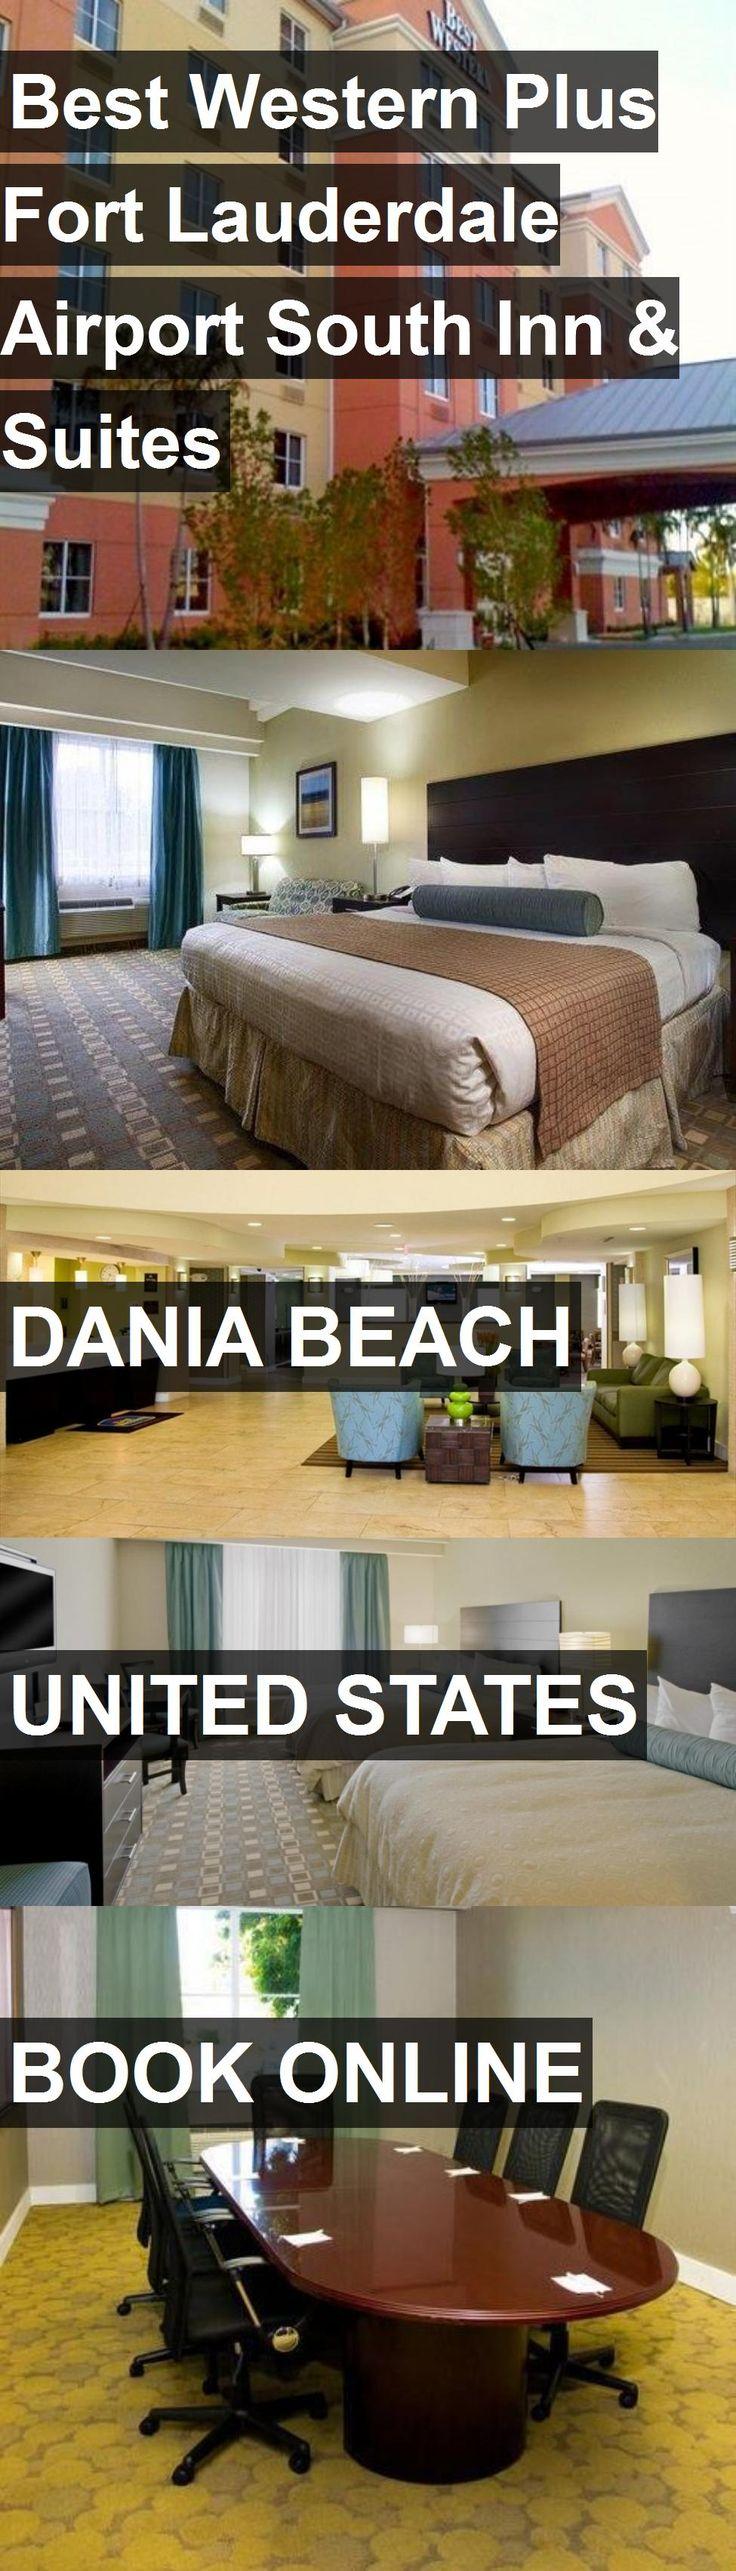 Hotel Best Western Plus Fort Lauderdale Airport South Inn